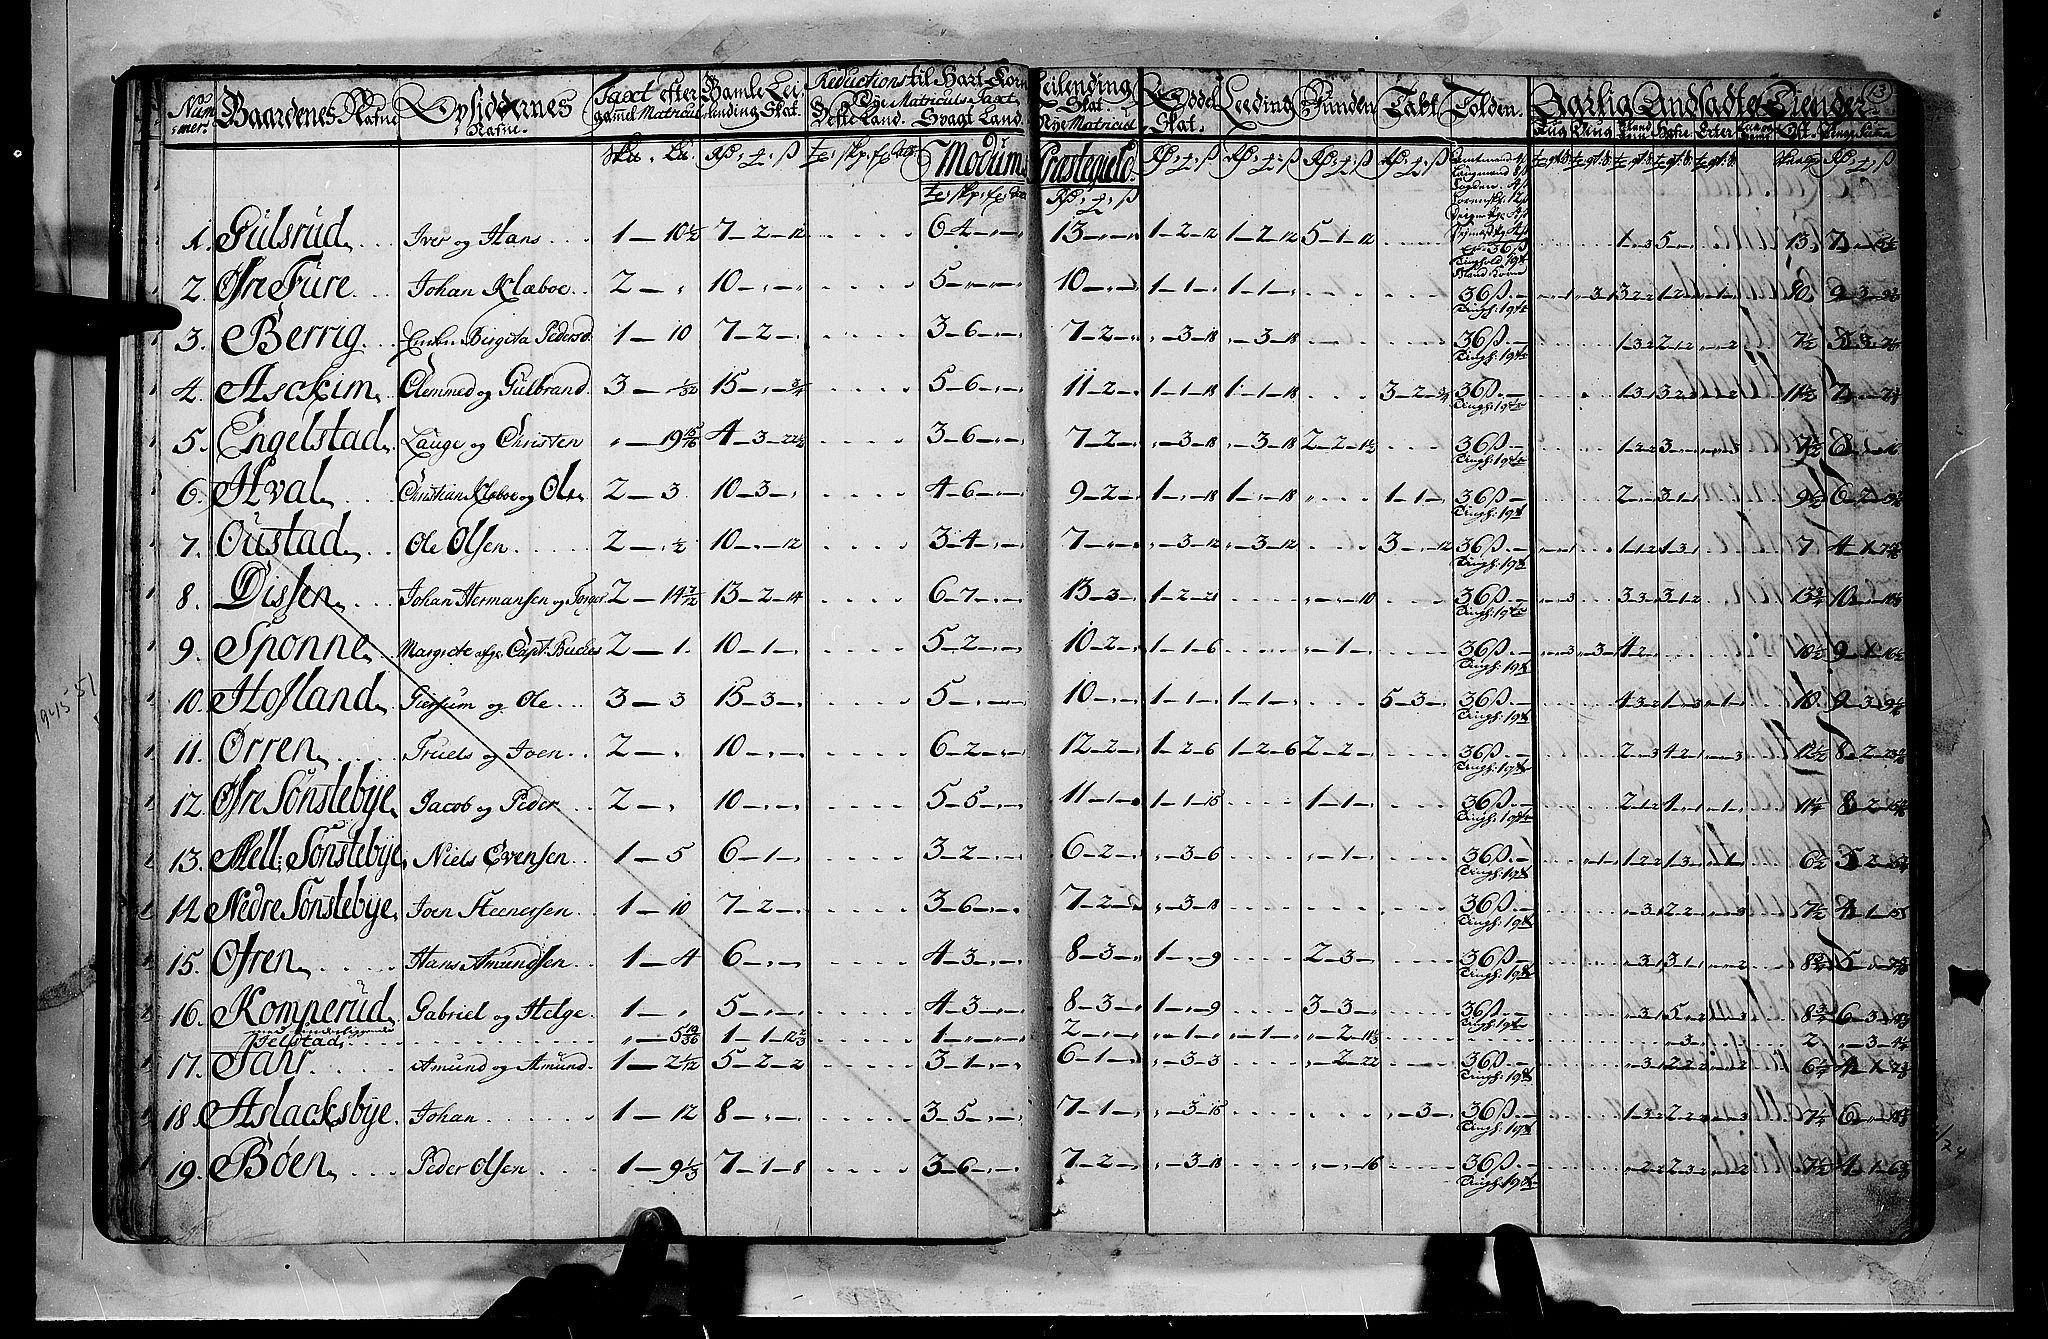 RA, Rentekammeret inntil 1814, Realistisk ordnet avdeling, N/Nb/Nbf/L0112: Buskerud matrikkelprotokoll, 1723, s. 12b-13a